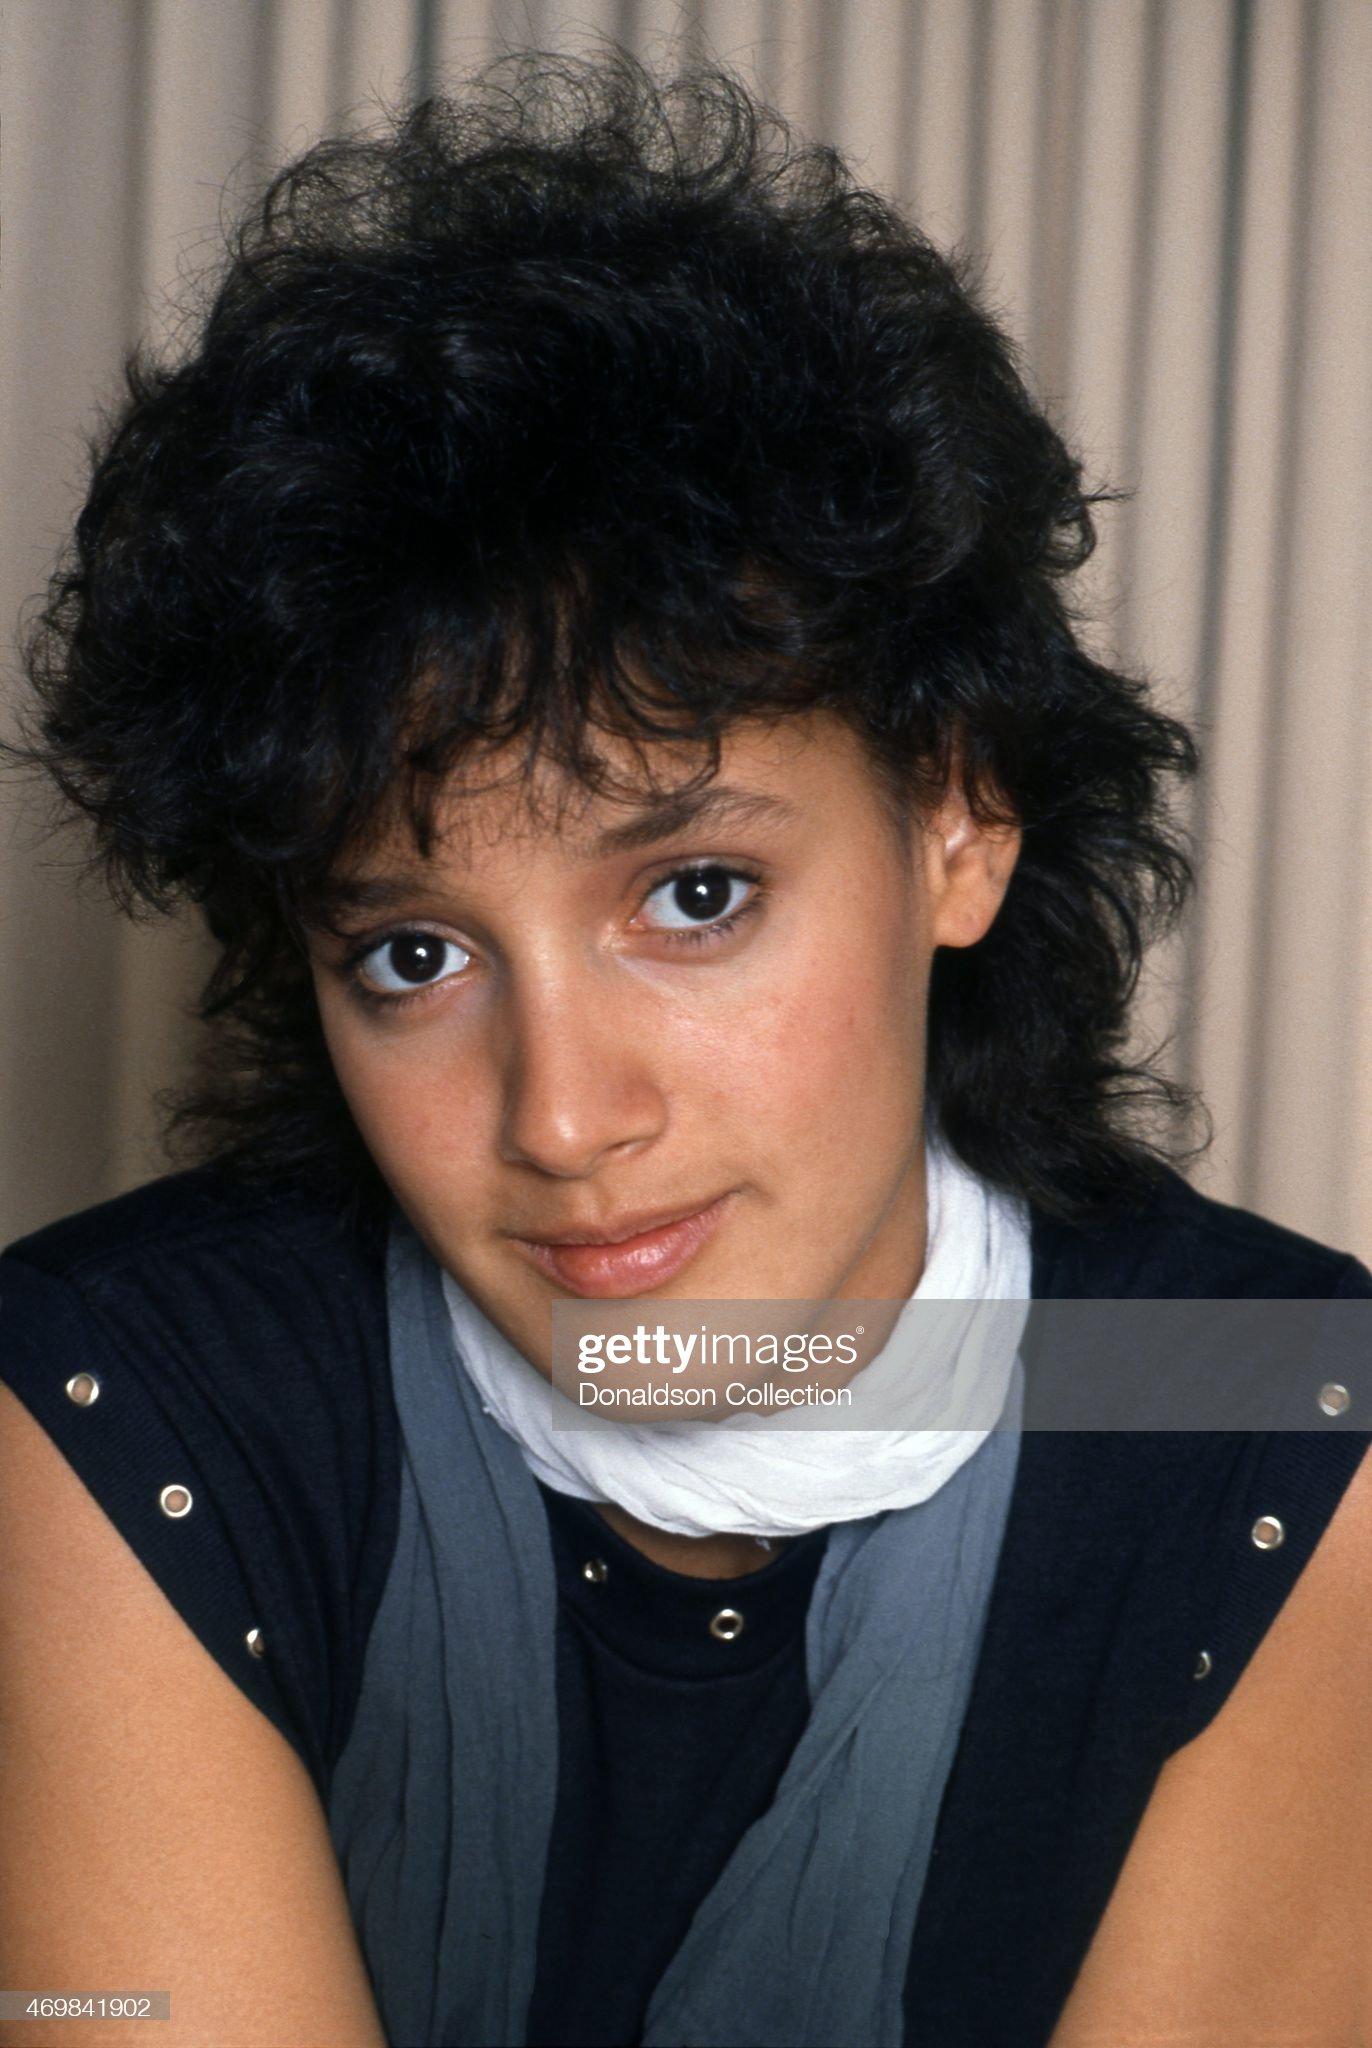 Raza negra y sus mezclas (Afrodescendientes) - Página 2 Actress-jennifer-beals-poses-for-a-portrait-on-april-29-1983-in-los-picture-id469841902?s=2048x2048